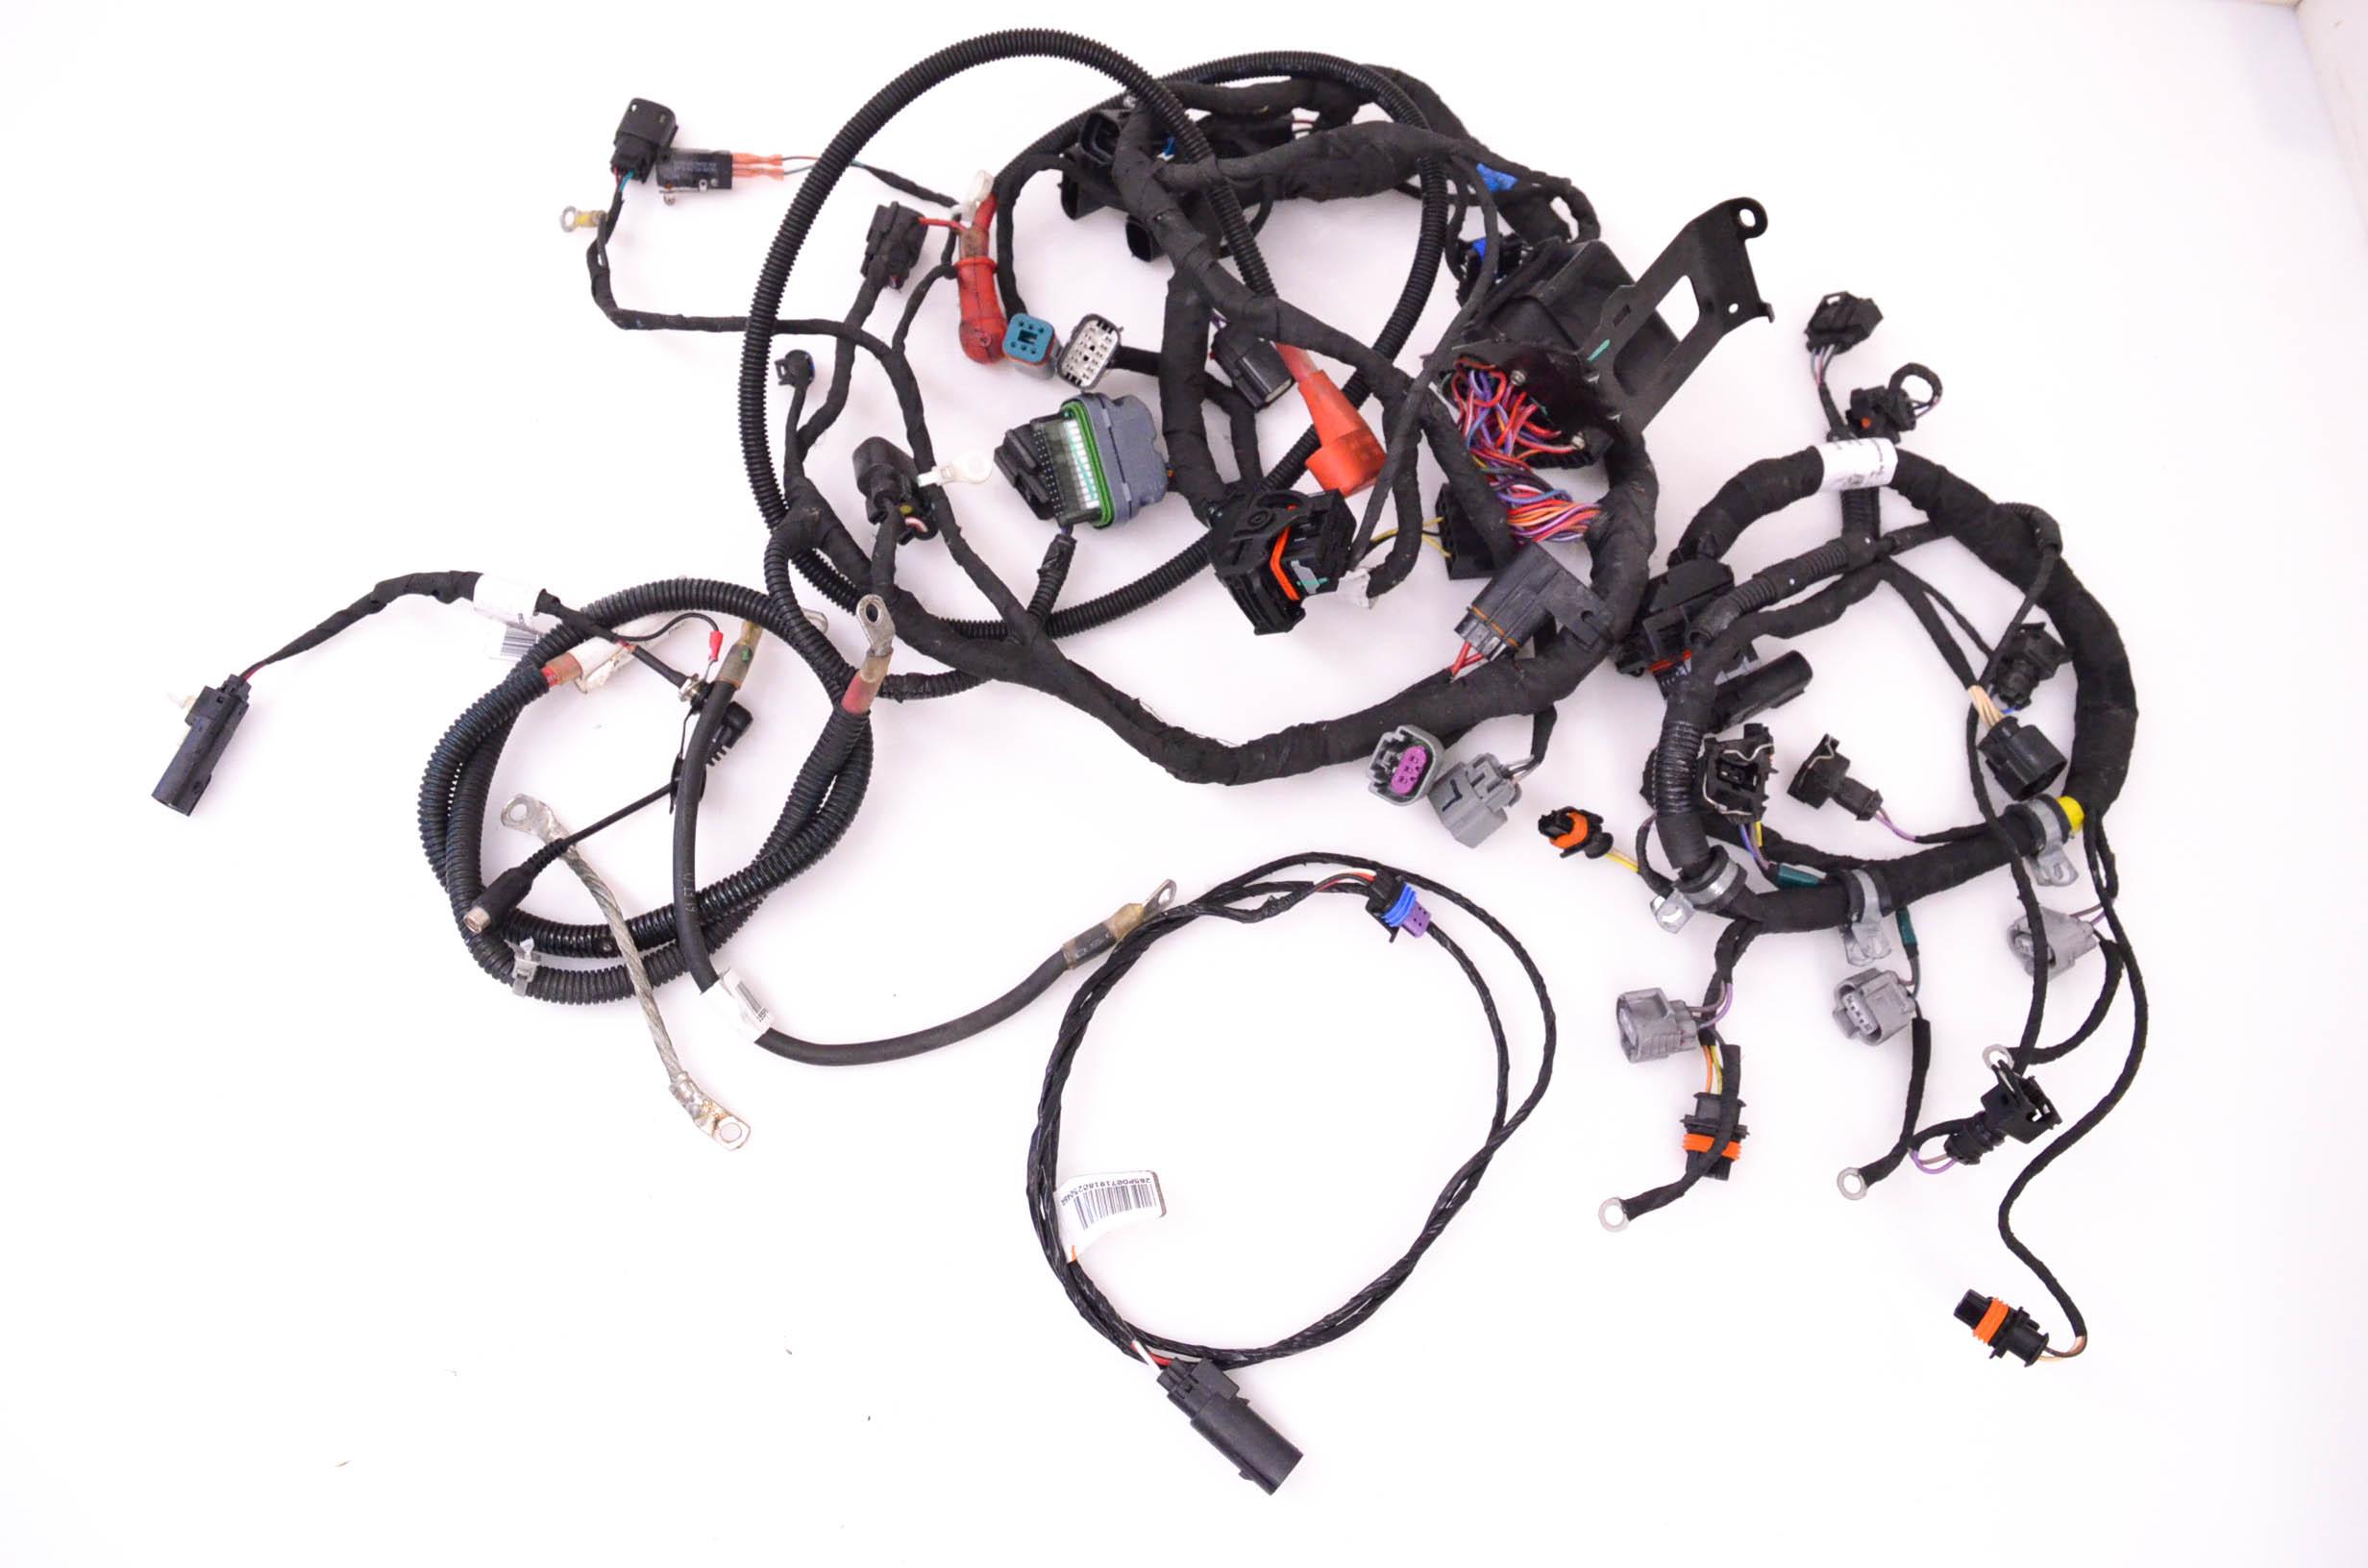 19 Ski Doo Renegade Adrenaline 900 Ace Wire Harness